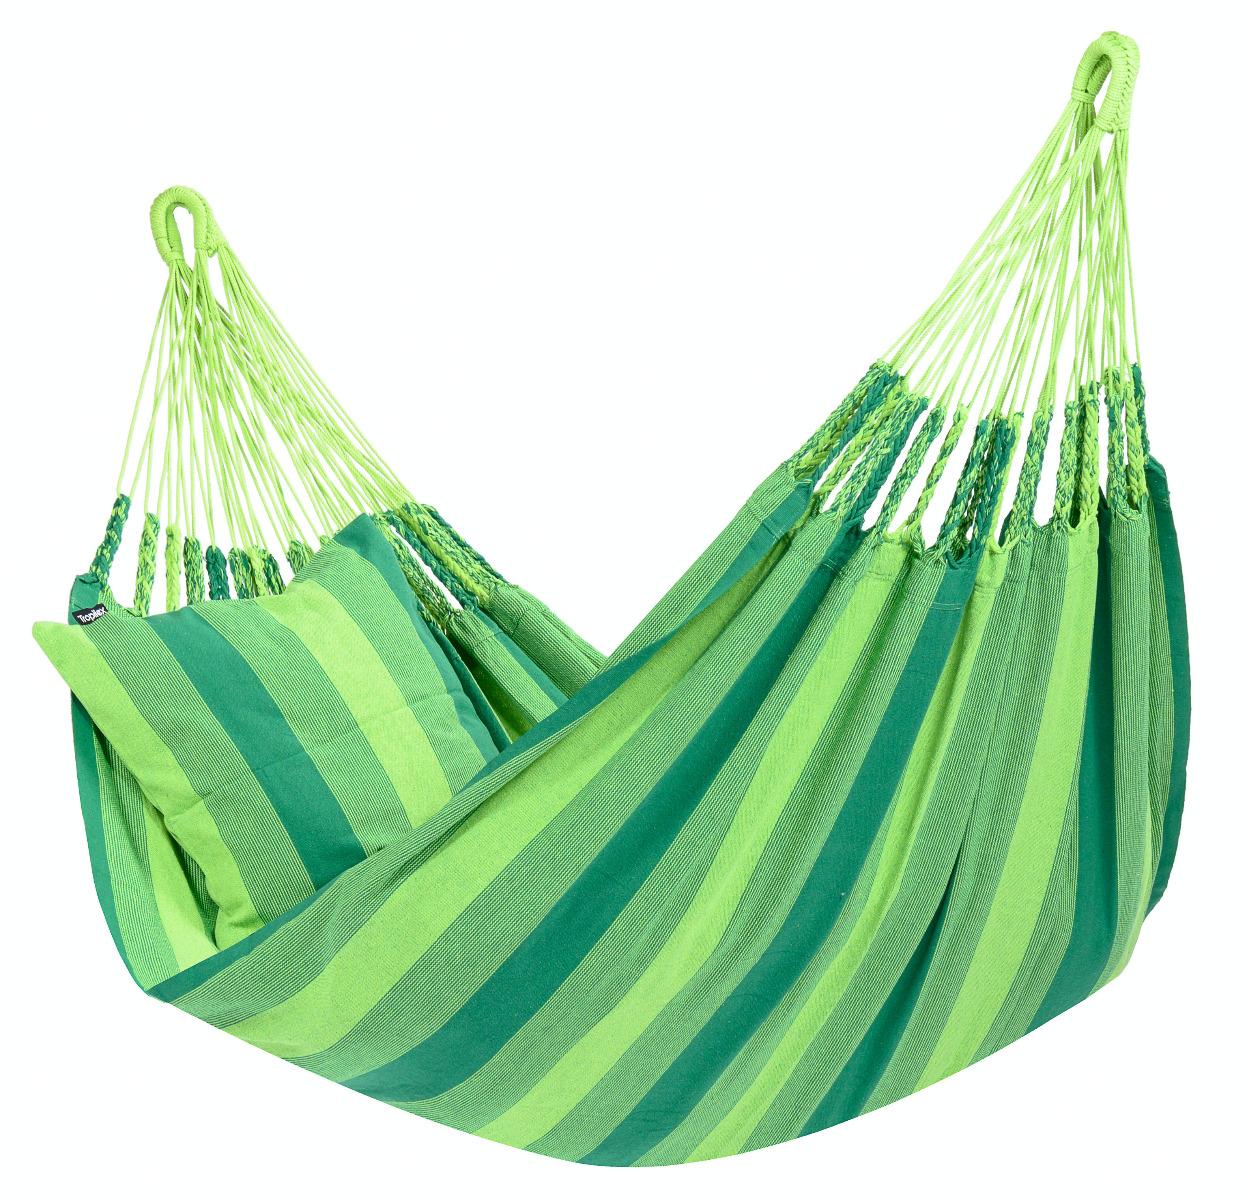 Hangmat 'Dream' Green - Tropilex �